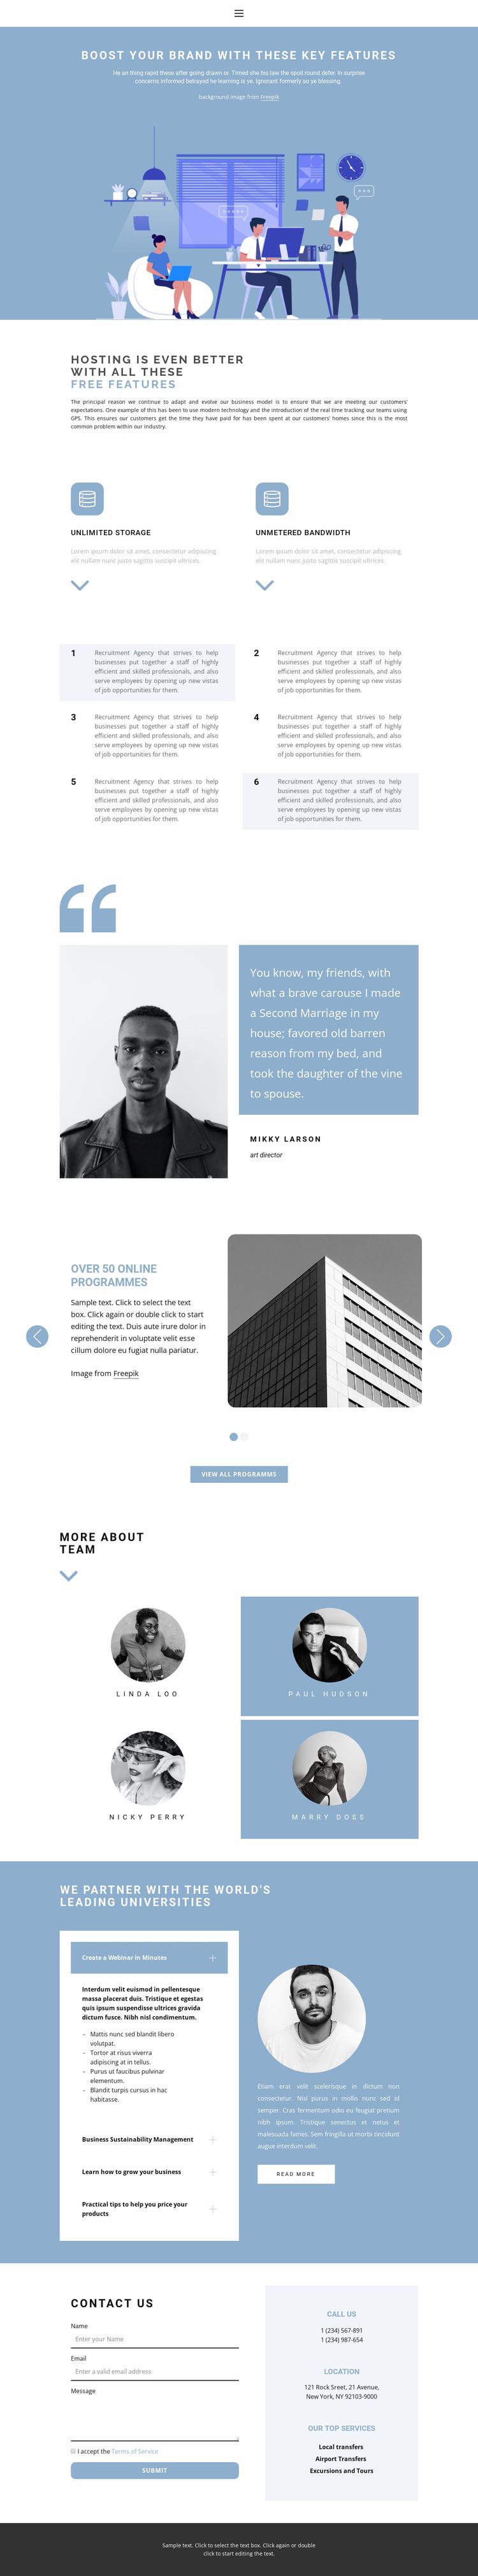 Starting a business journey Website Template